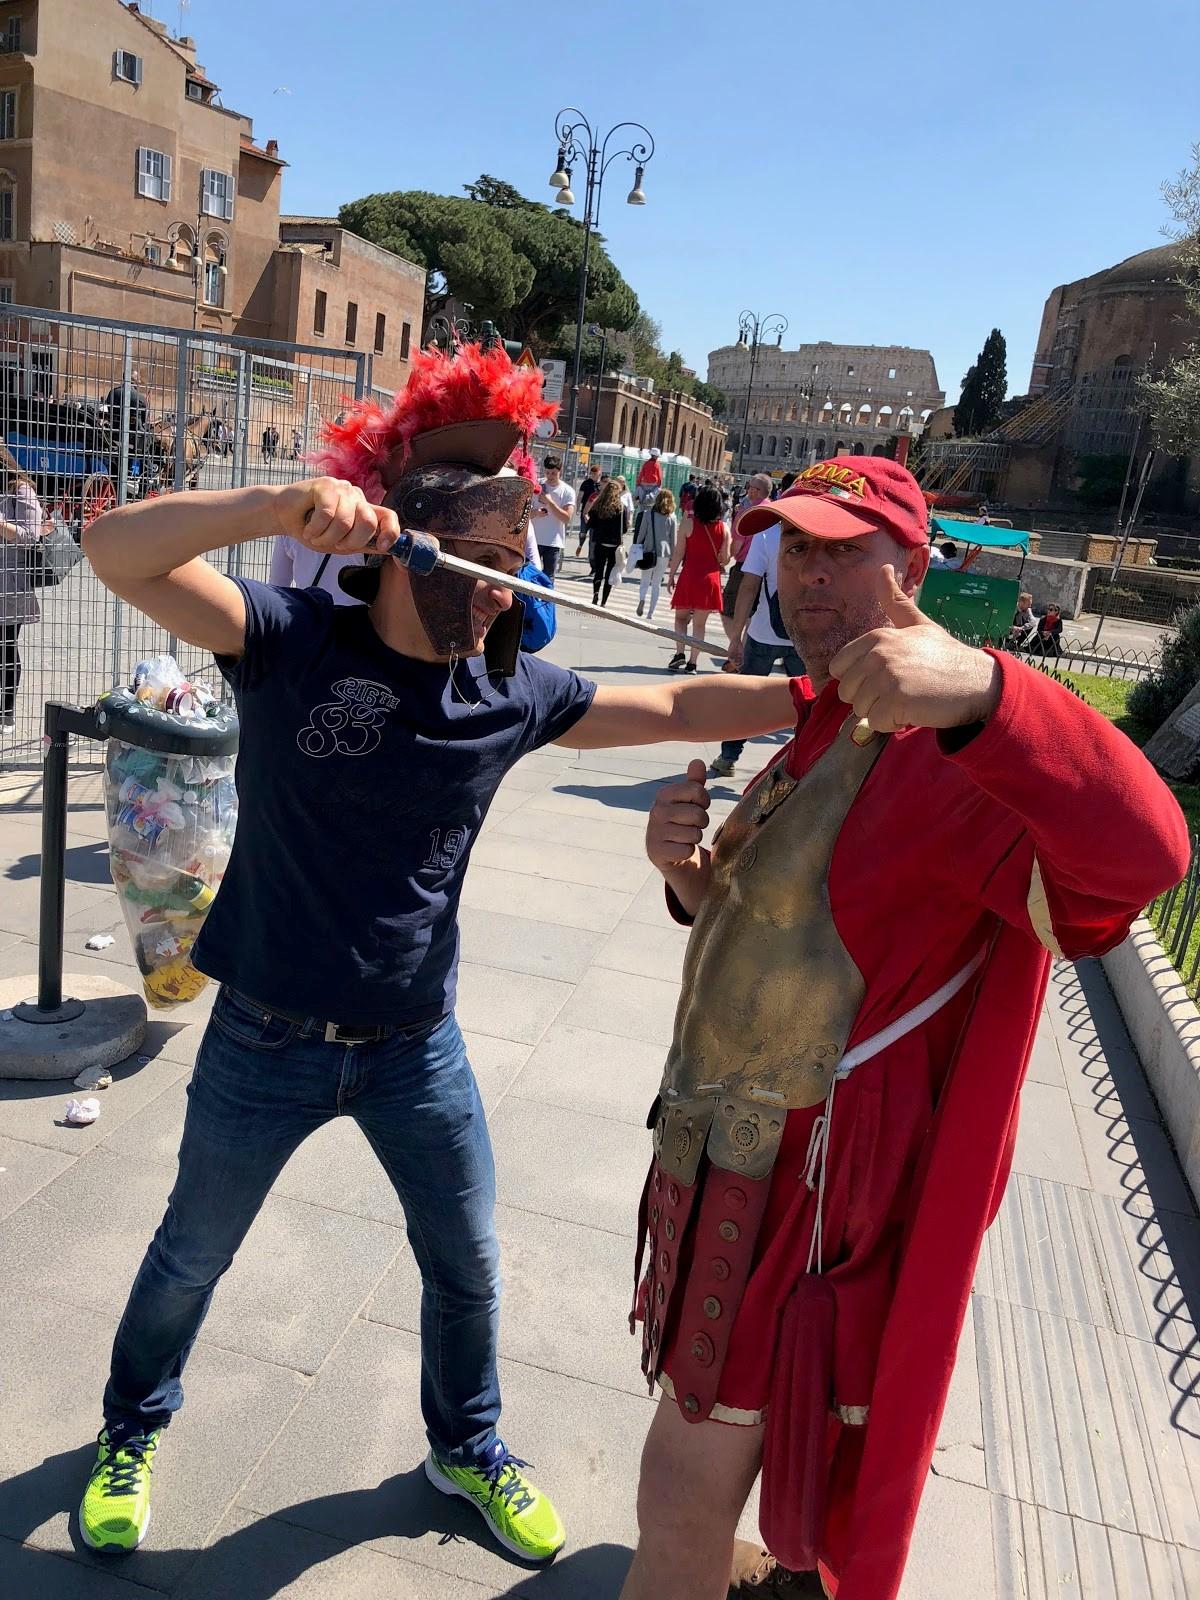 [Хабра-оффтоп] Maratona di Roma, или первый марафон для ИТ-шника - 22